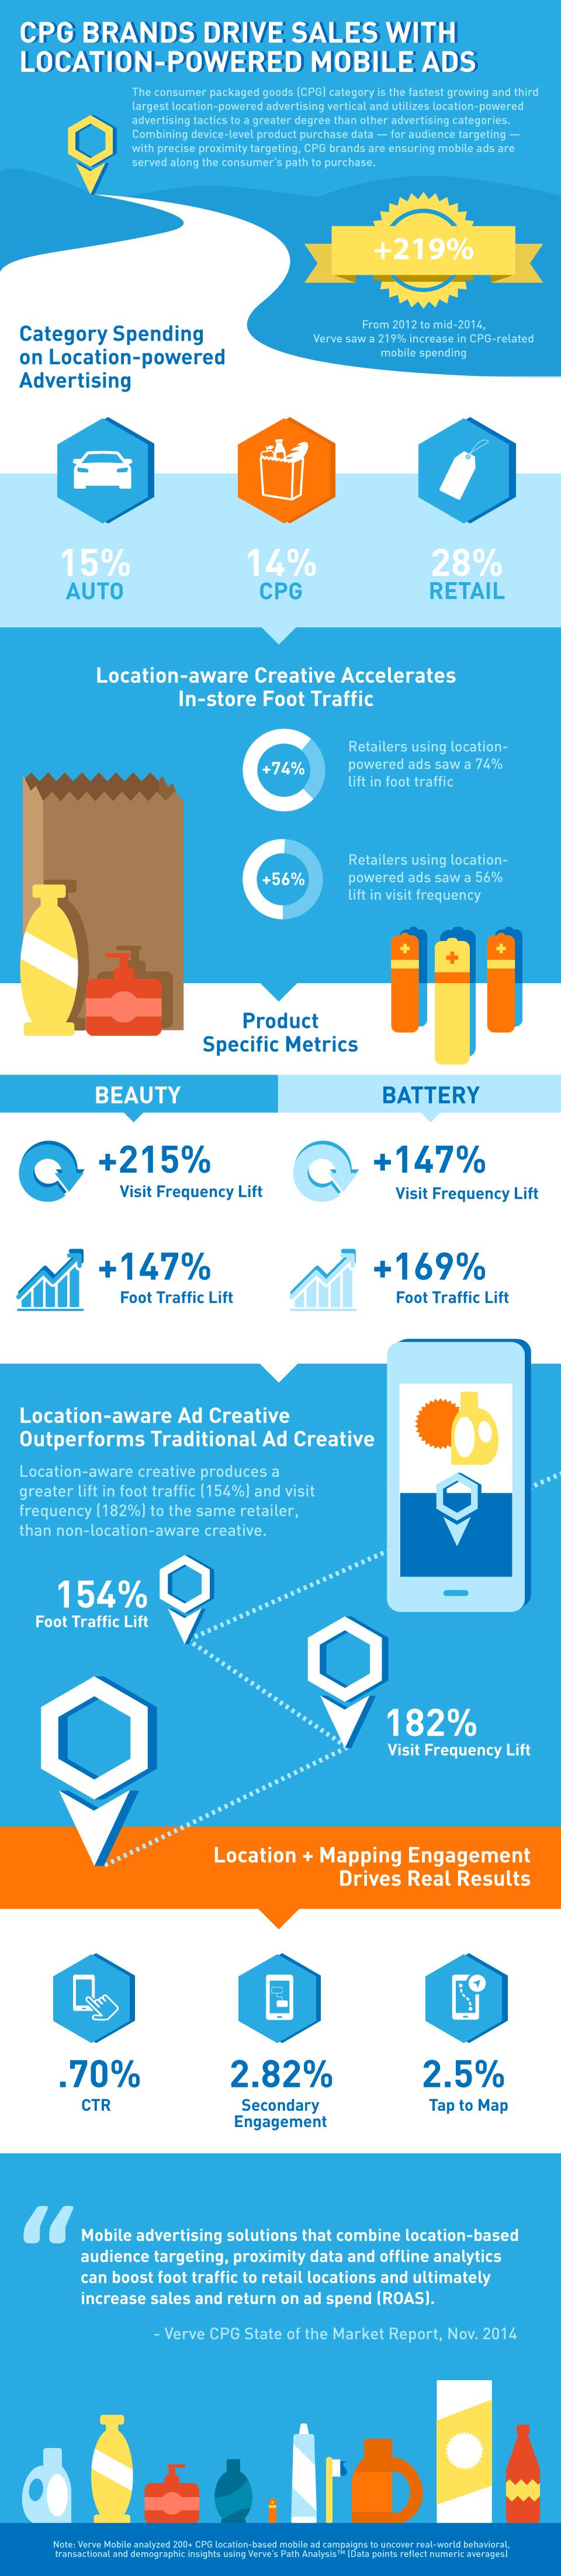 FMCG.Retailers.location based marketing